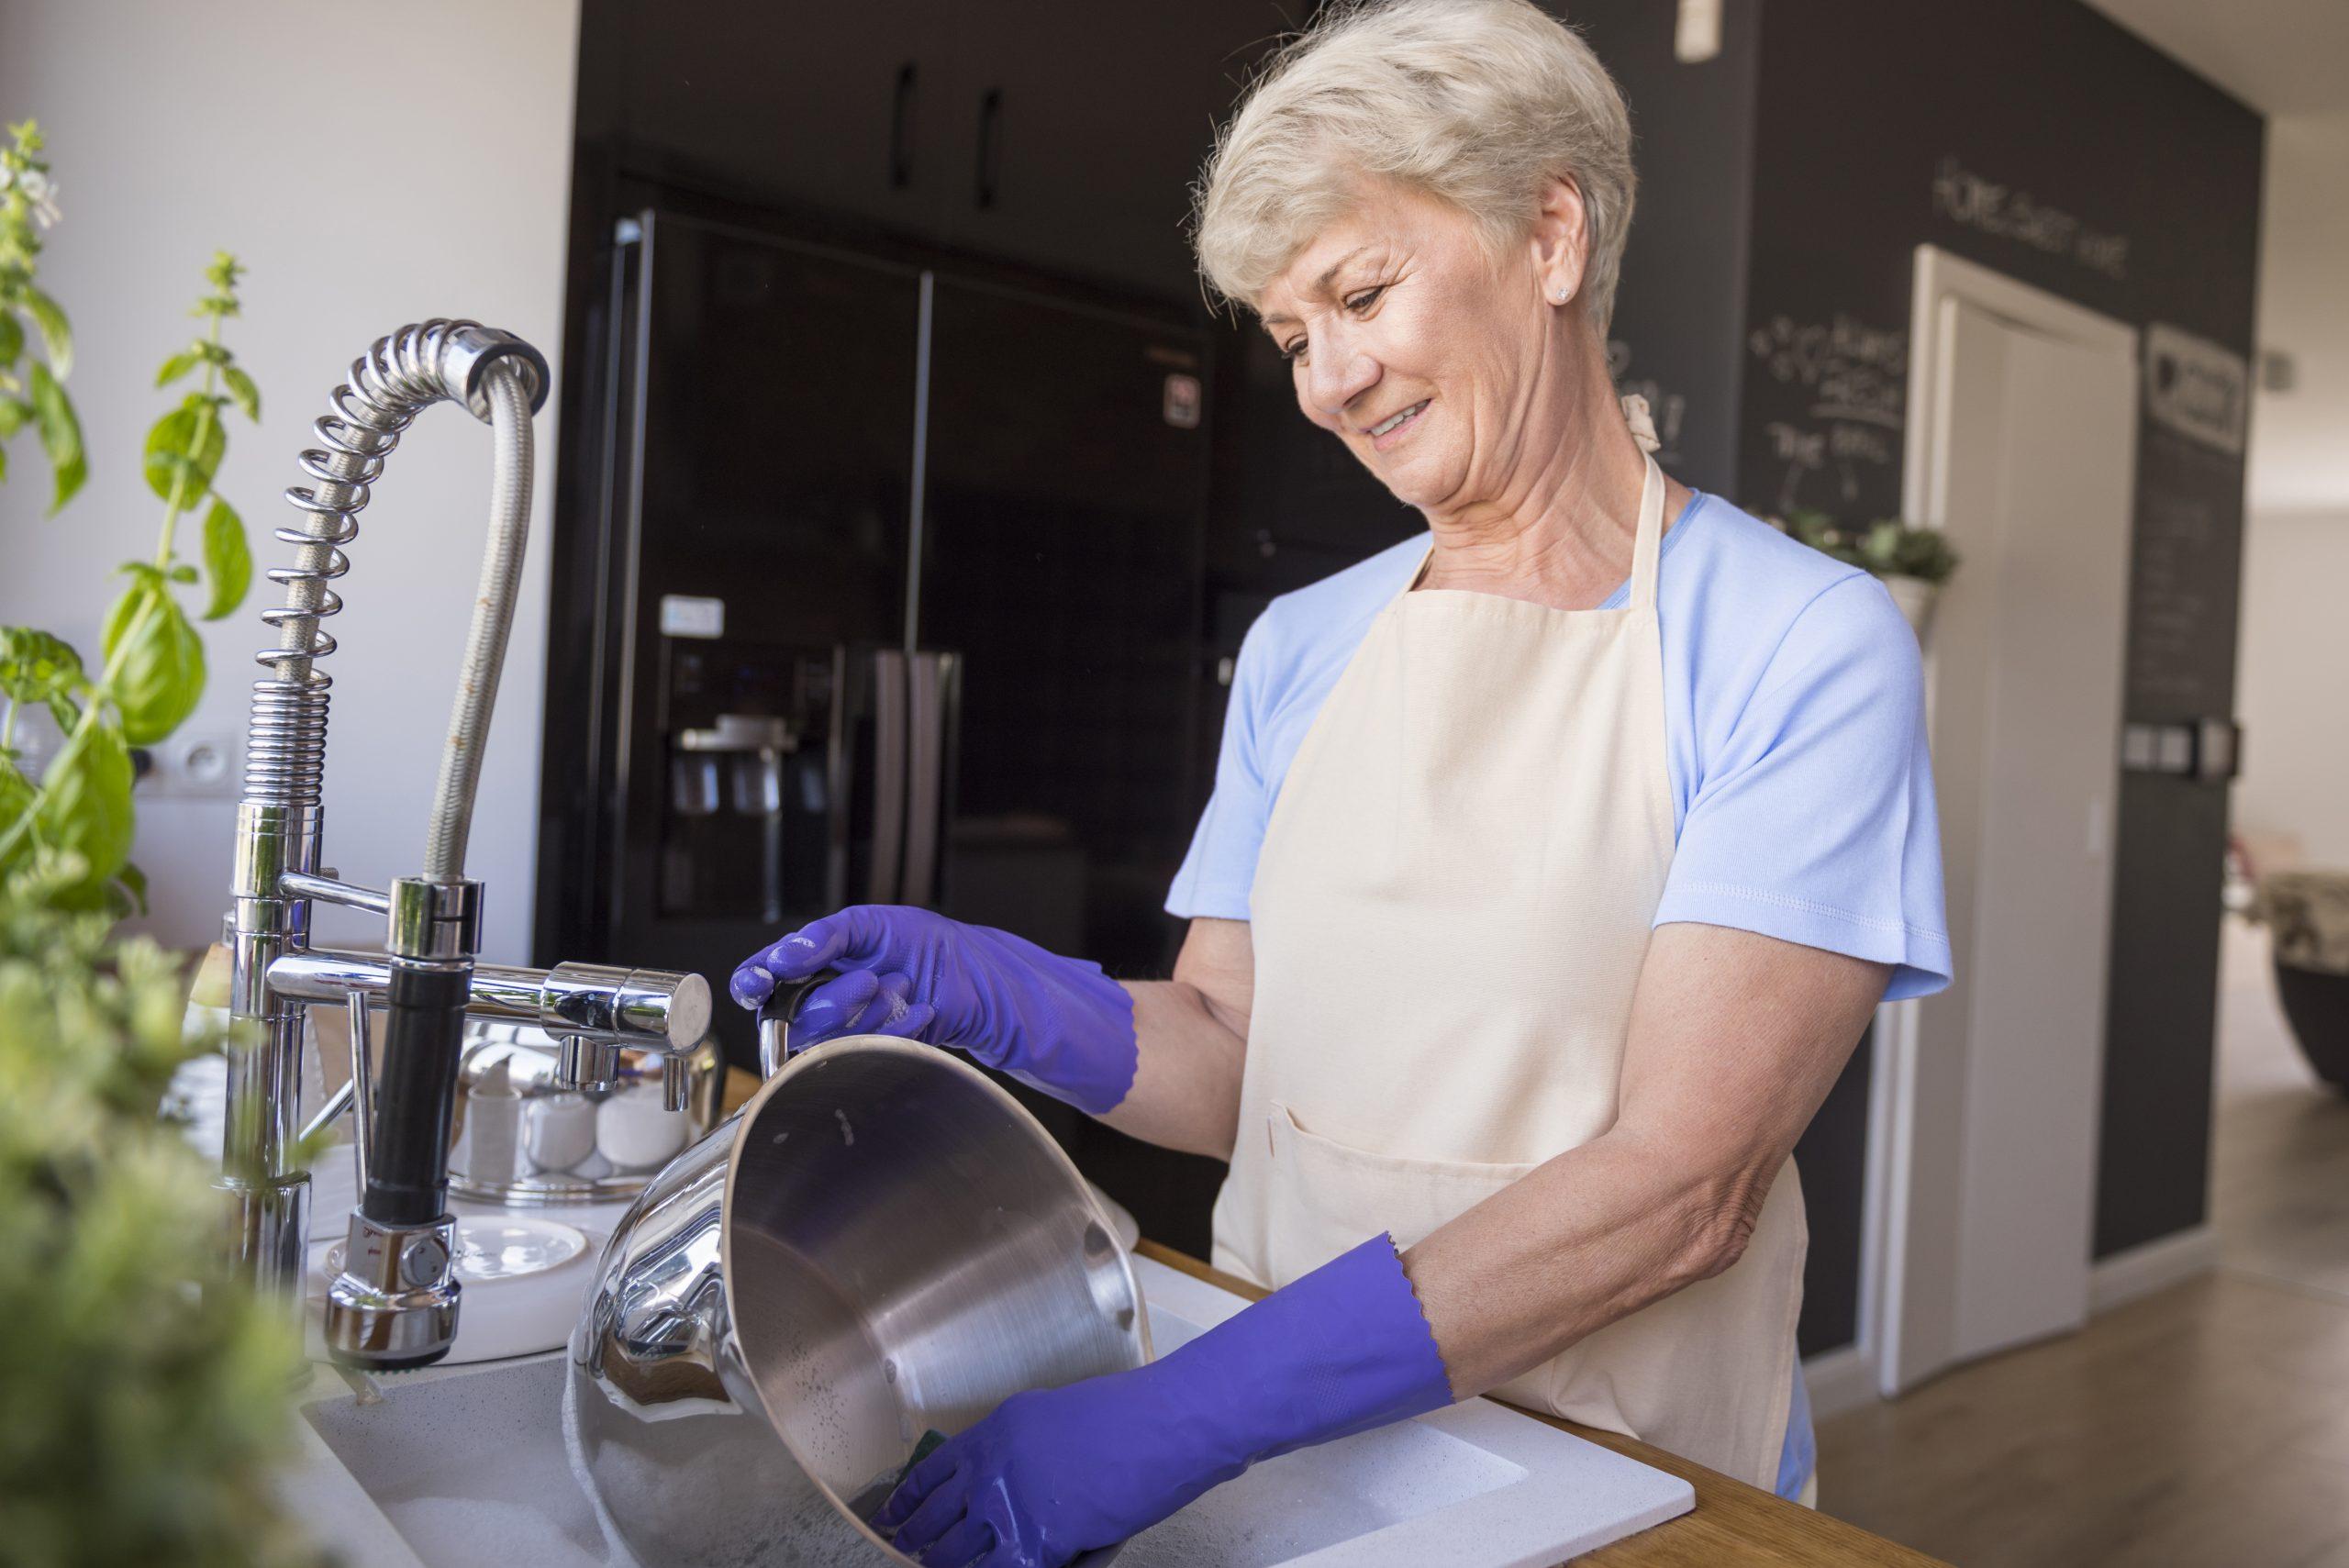 mujer mayor lavando freidora